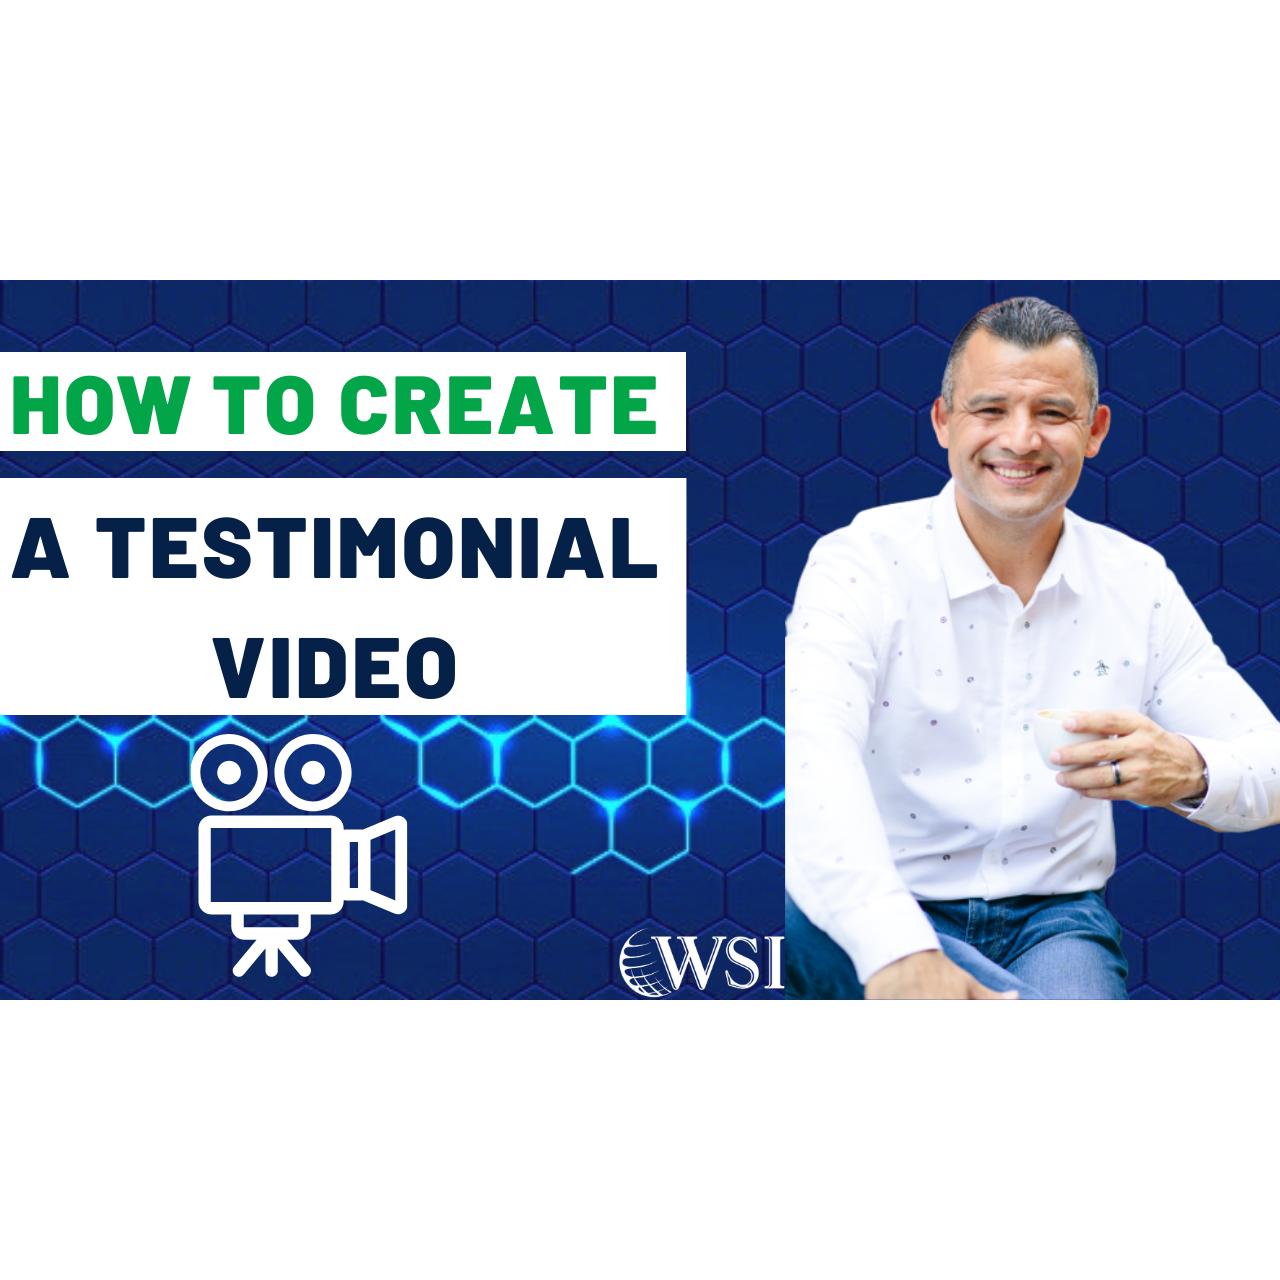 How To Create A Testimonial Video